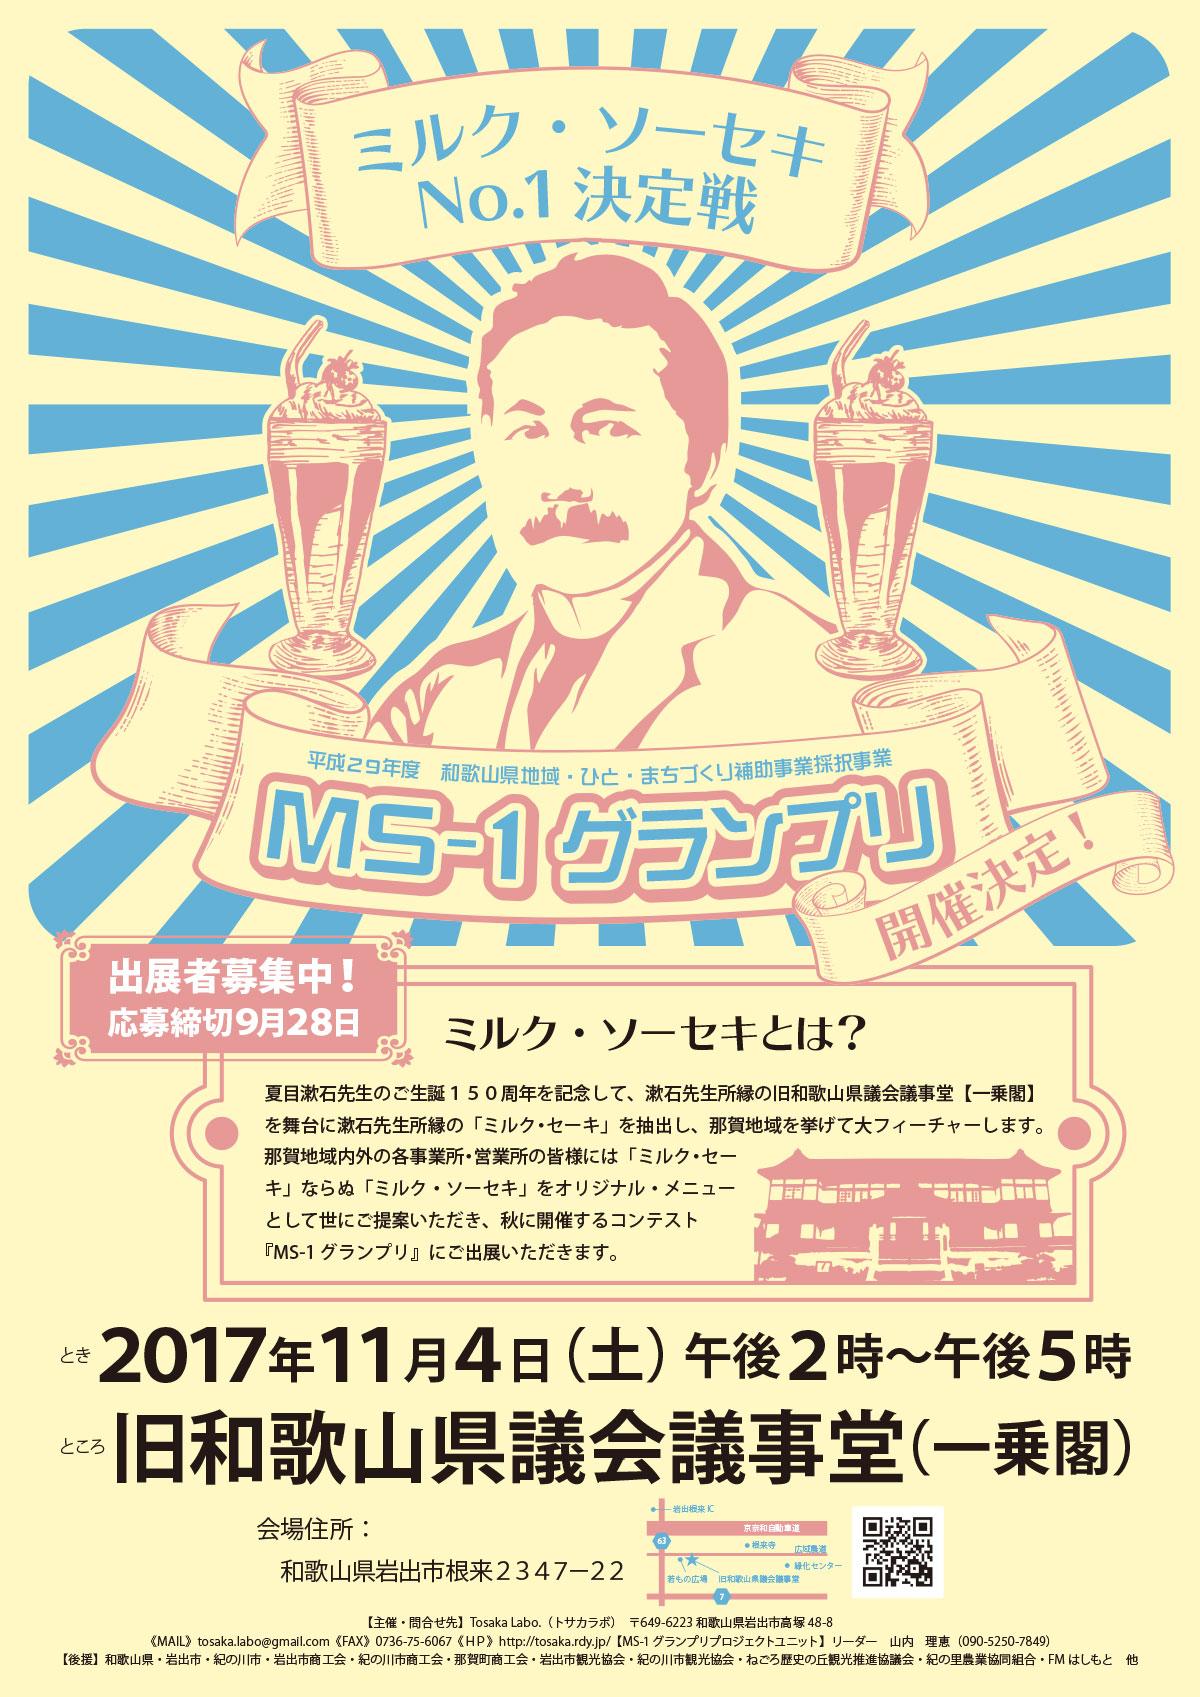 MS−1 グランプリ 告知ポスター制作